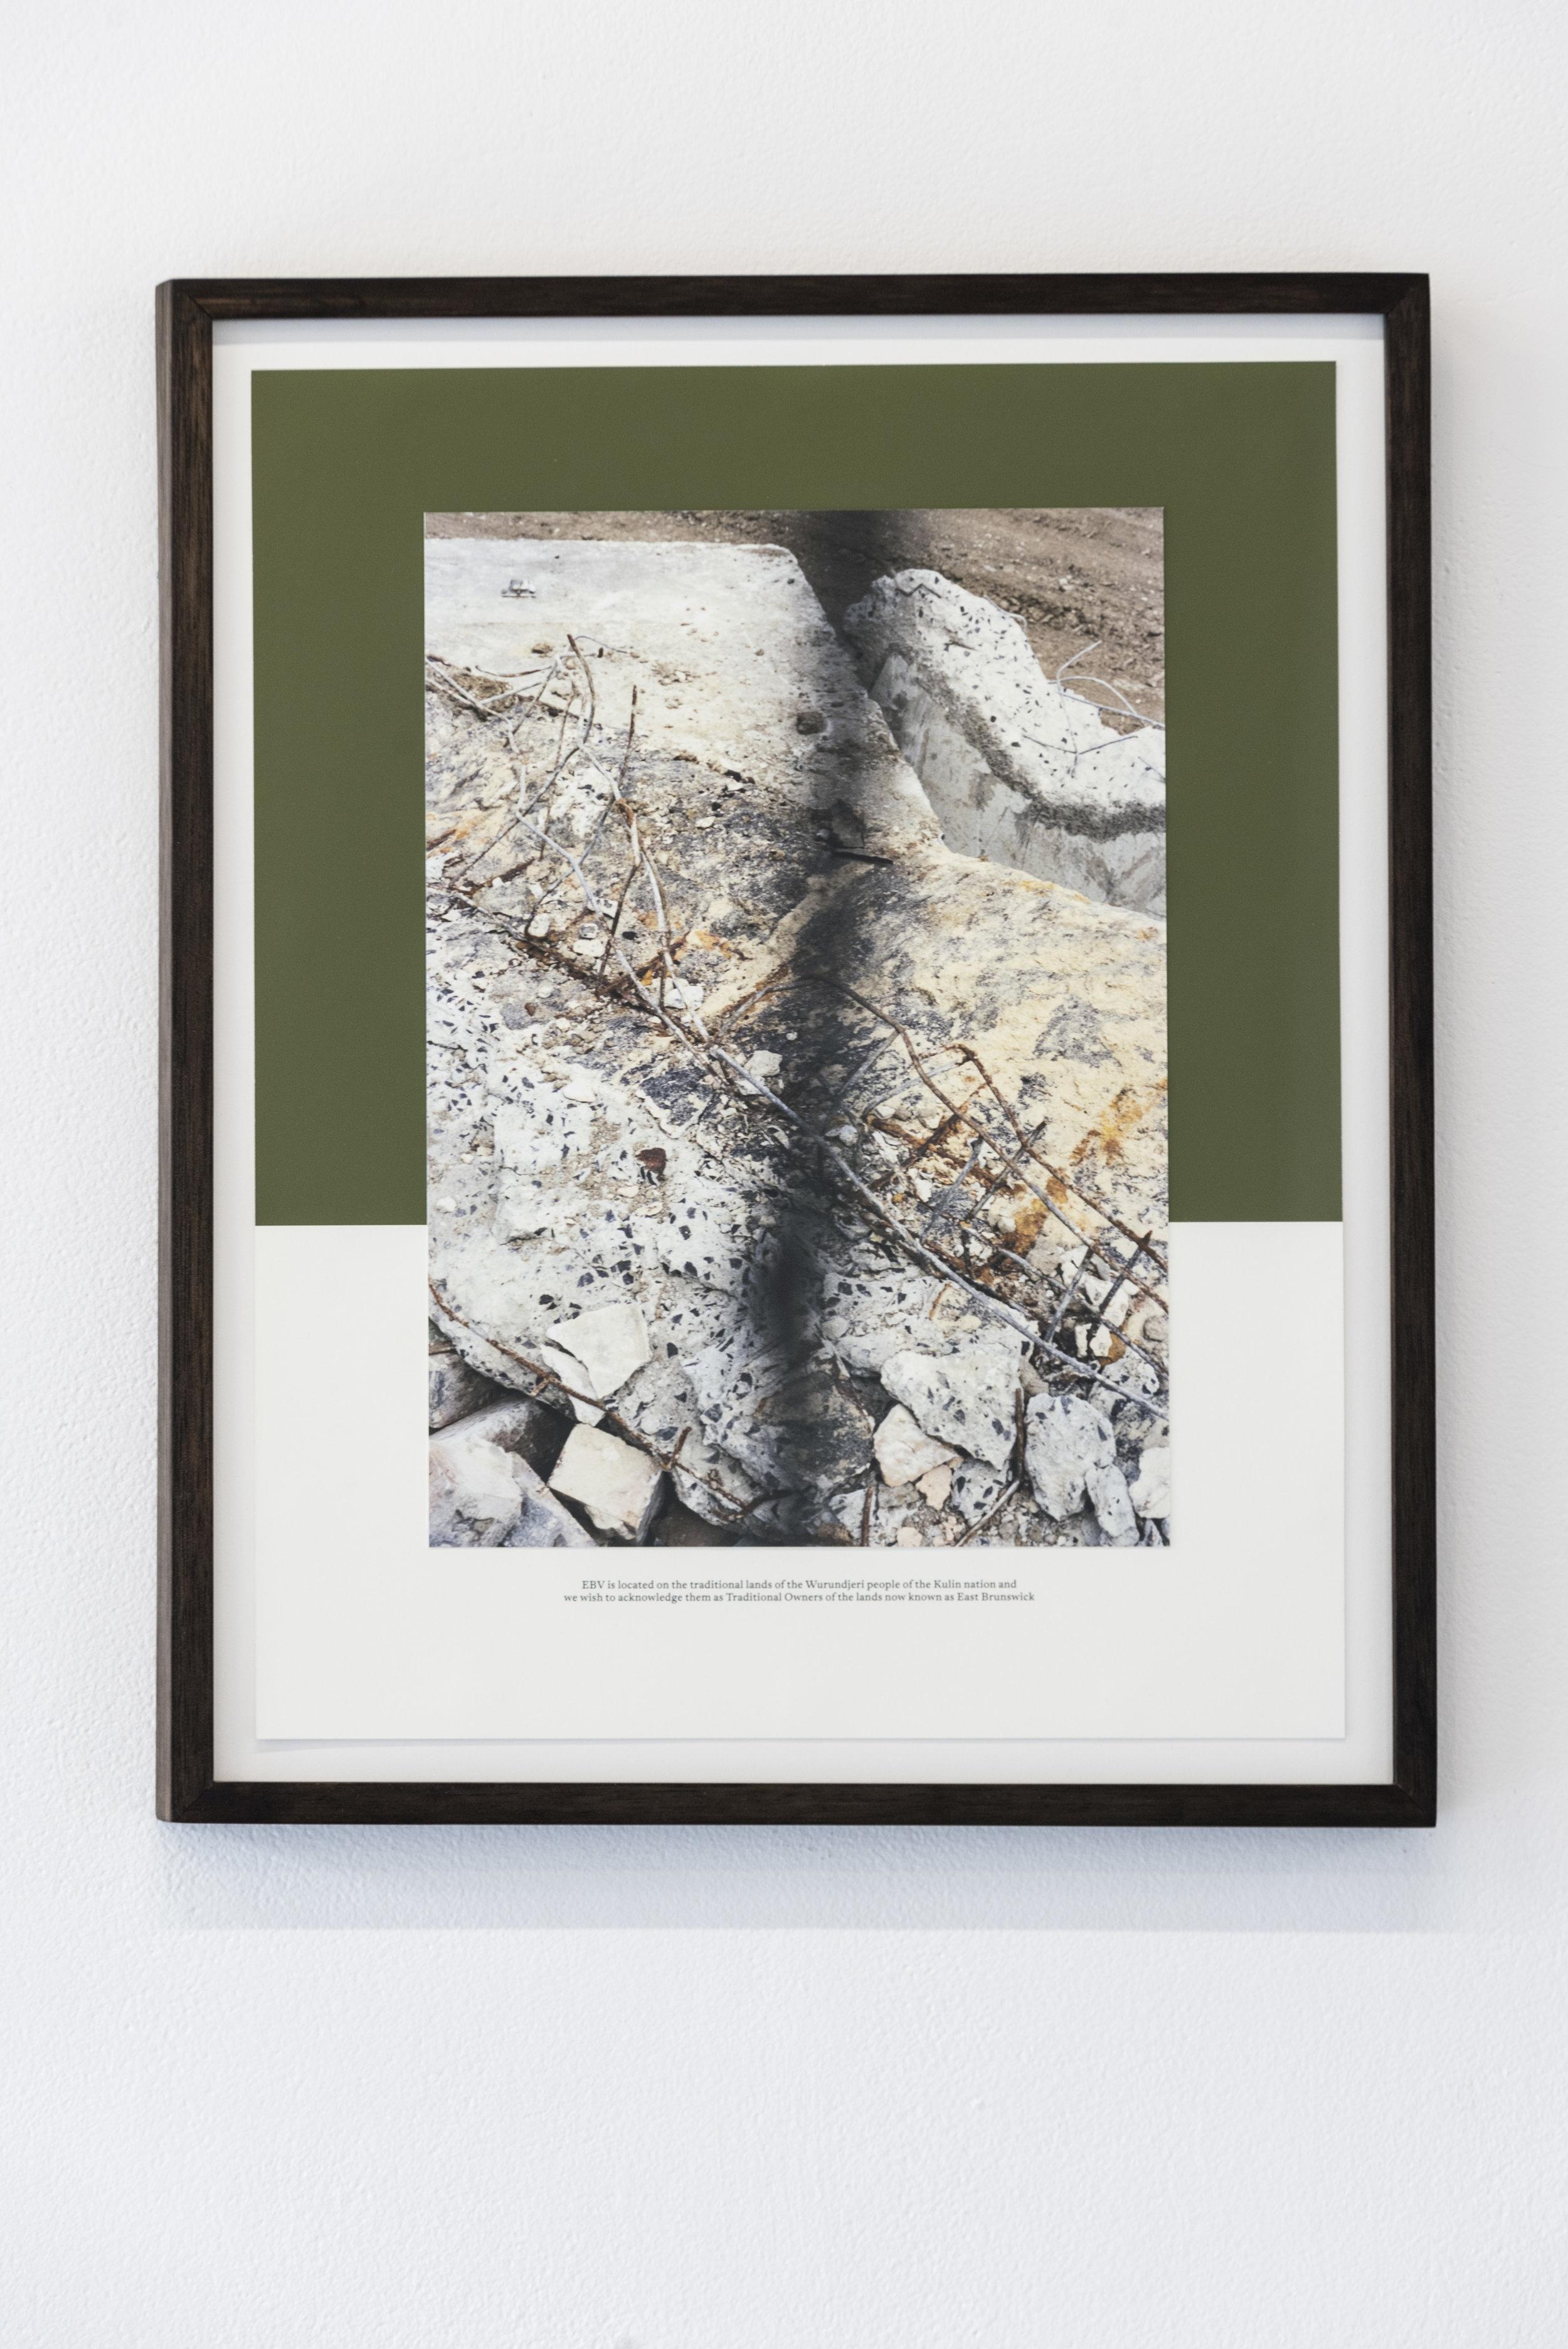 Rebecca McCauley  Nicholson St (East Brunswick Village)   Mounted Giclee Print with company copy  25 x 35 cm  2018  Photo by Aaron Claringbold